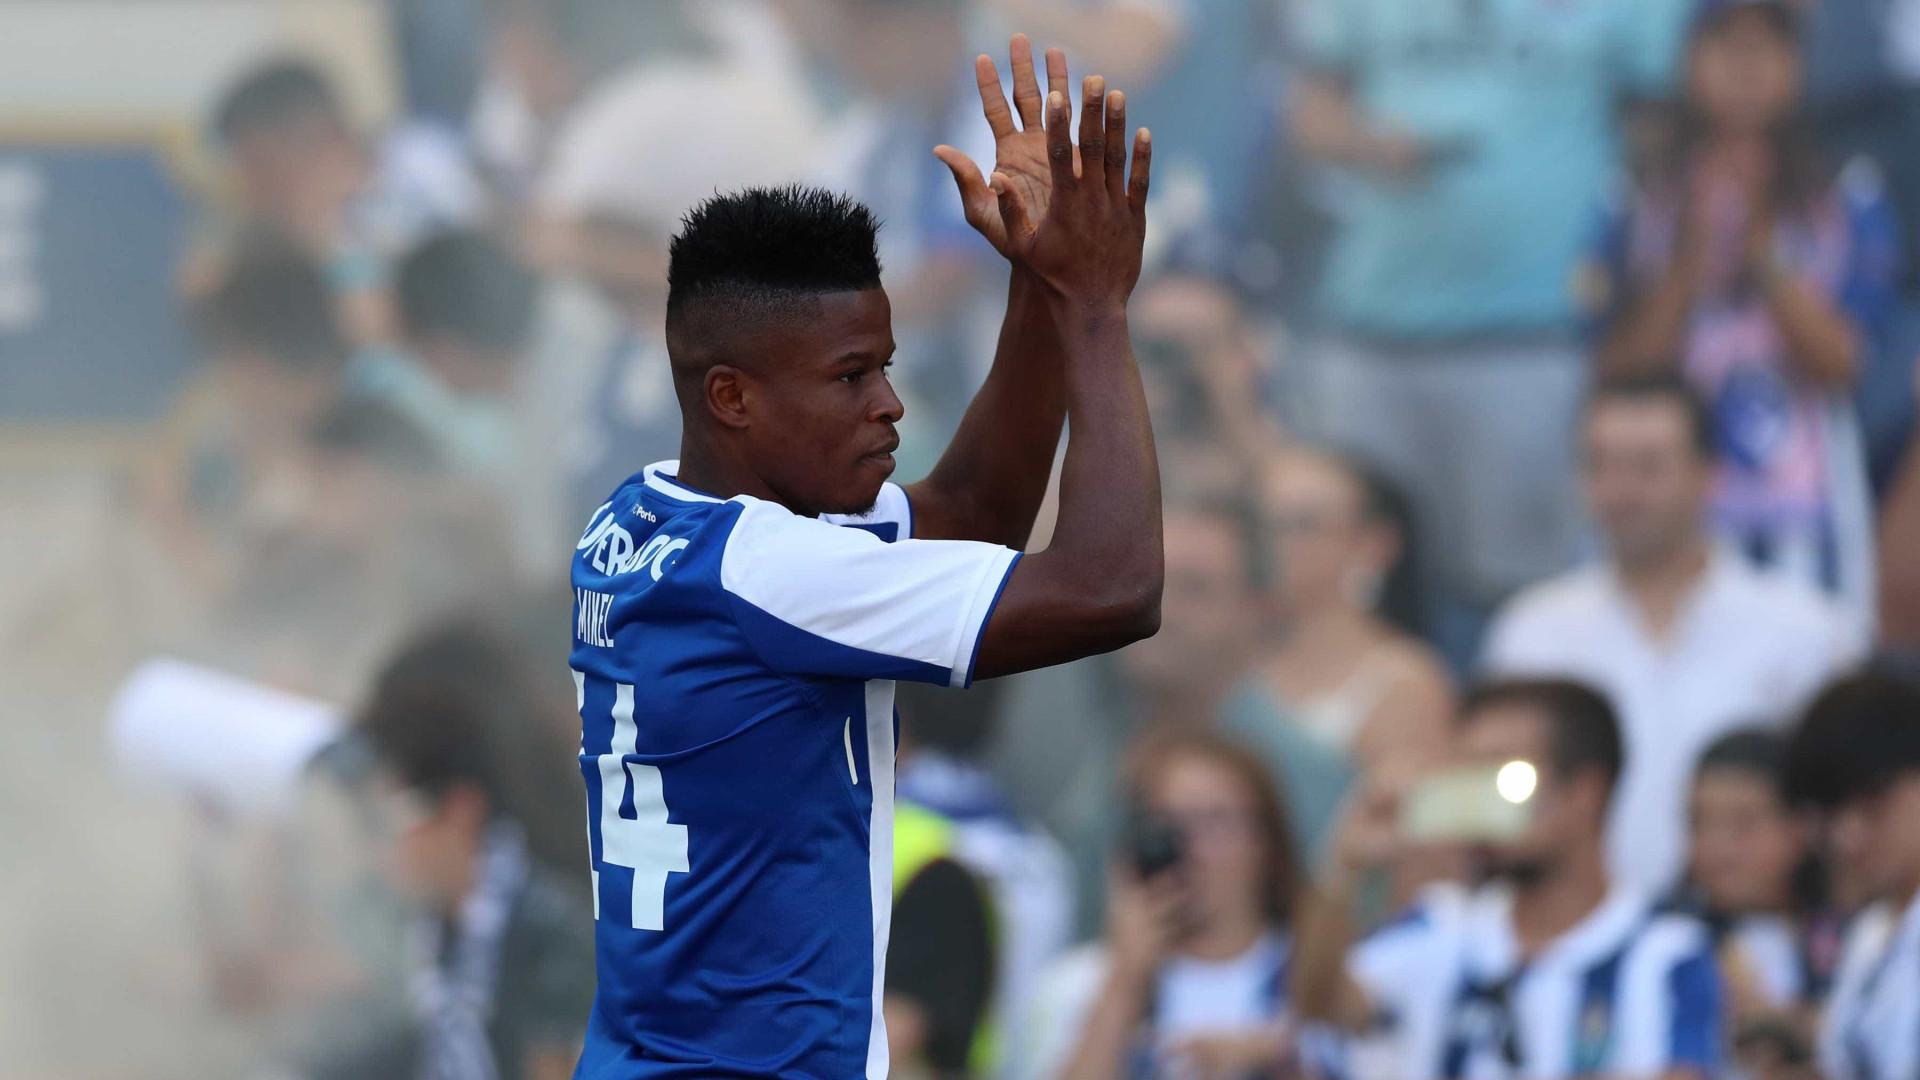 Mikel Agu emprestado ao Bursaspor (OFICIAL) — FC Porto